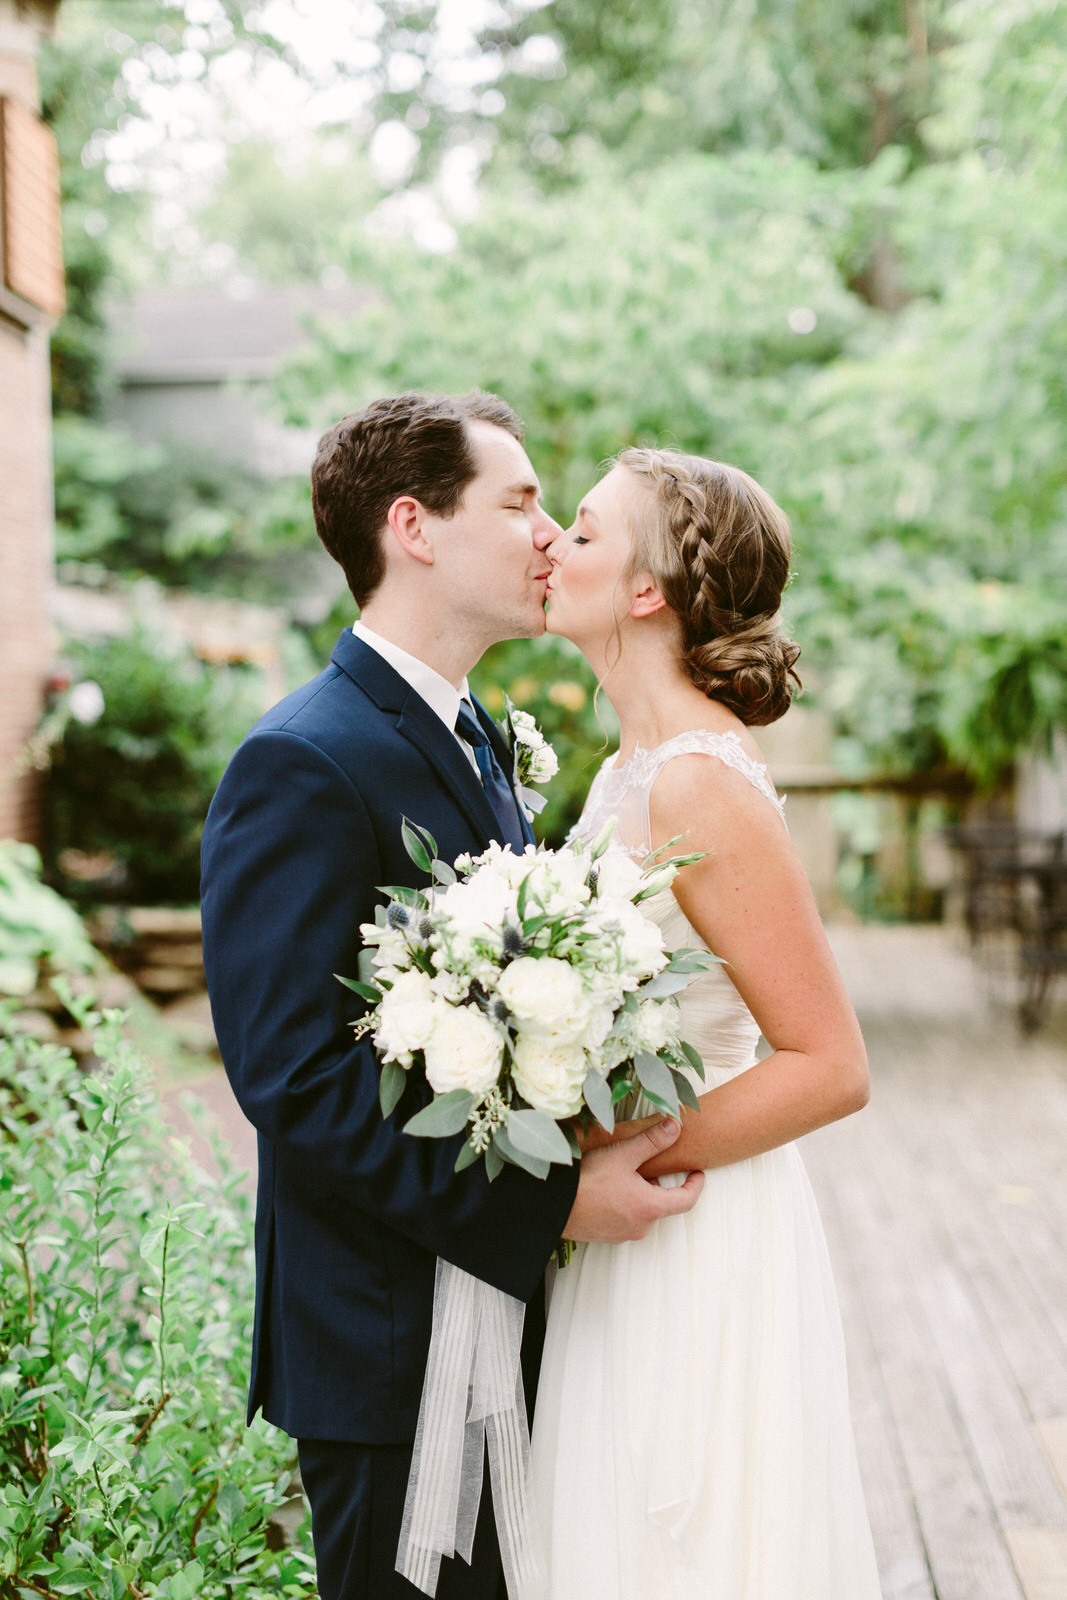 KatiMallory-Fayetteville Wedding Florist-2037.JPG